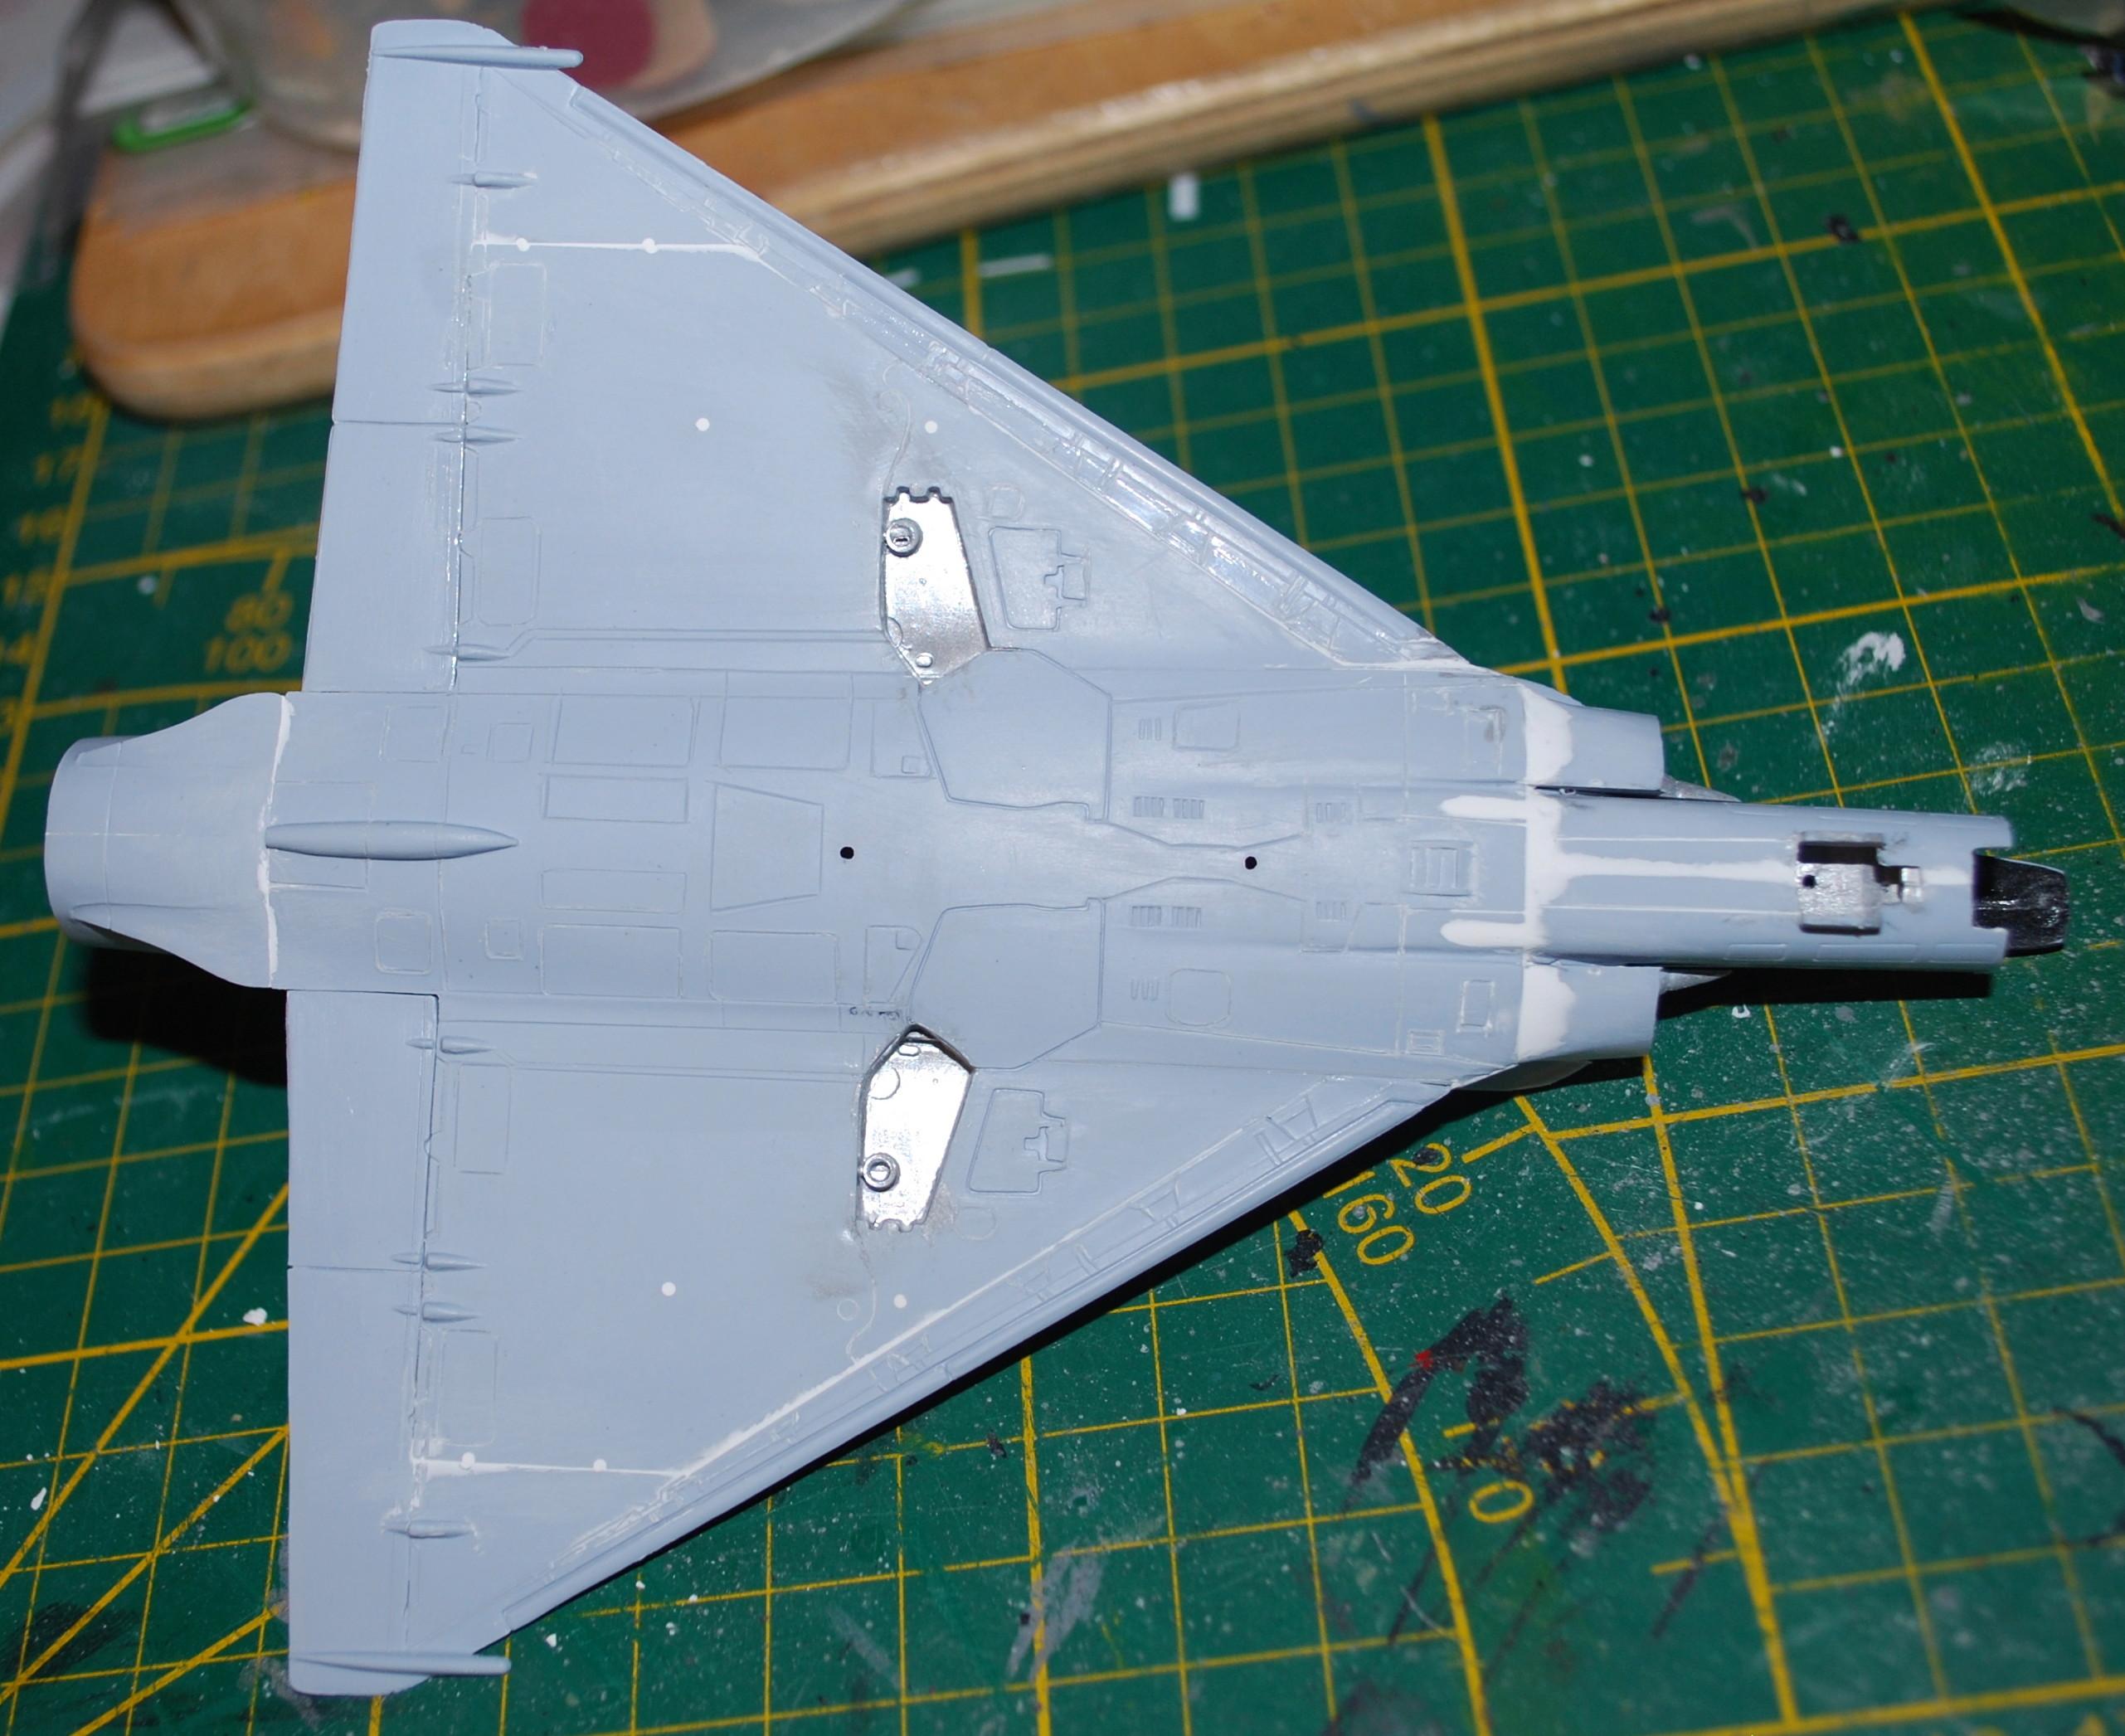 Mirage 2000B Banc d'essai Rafale 1/72 Heller/FFSMC 2017 2000b_17